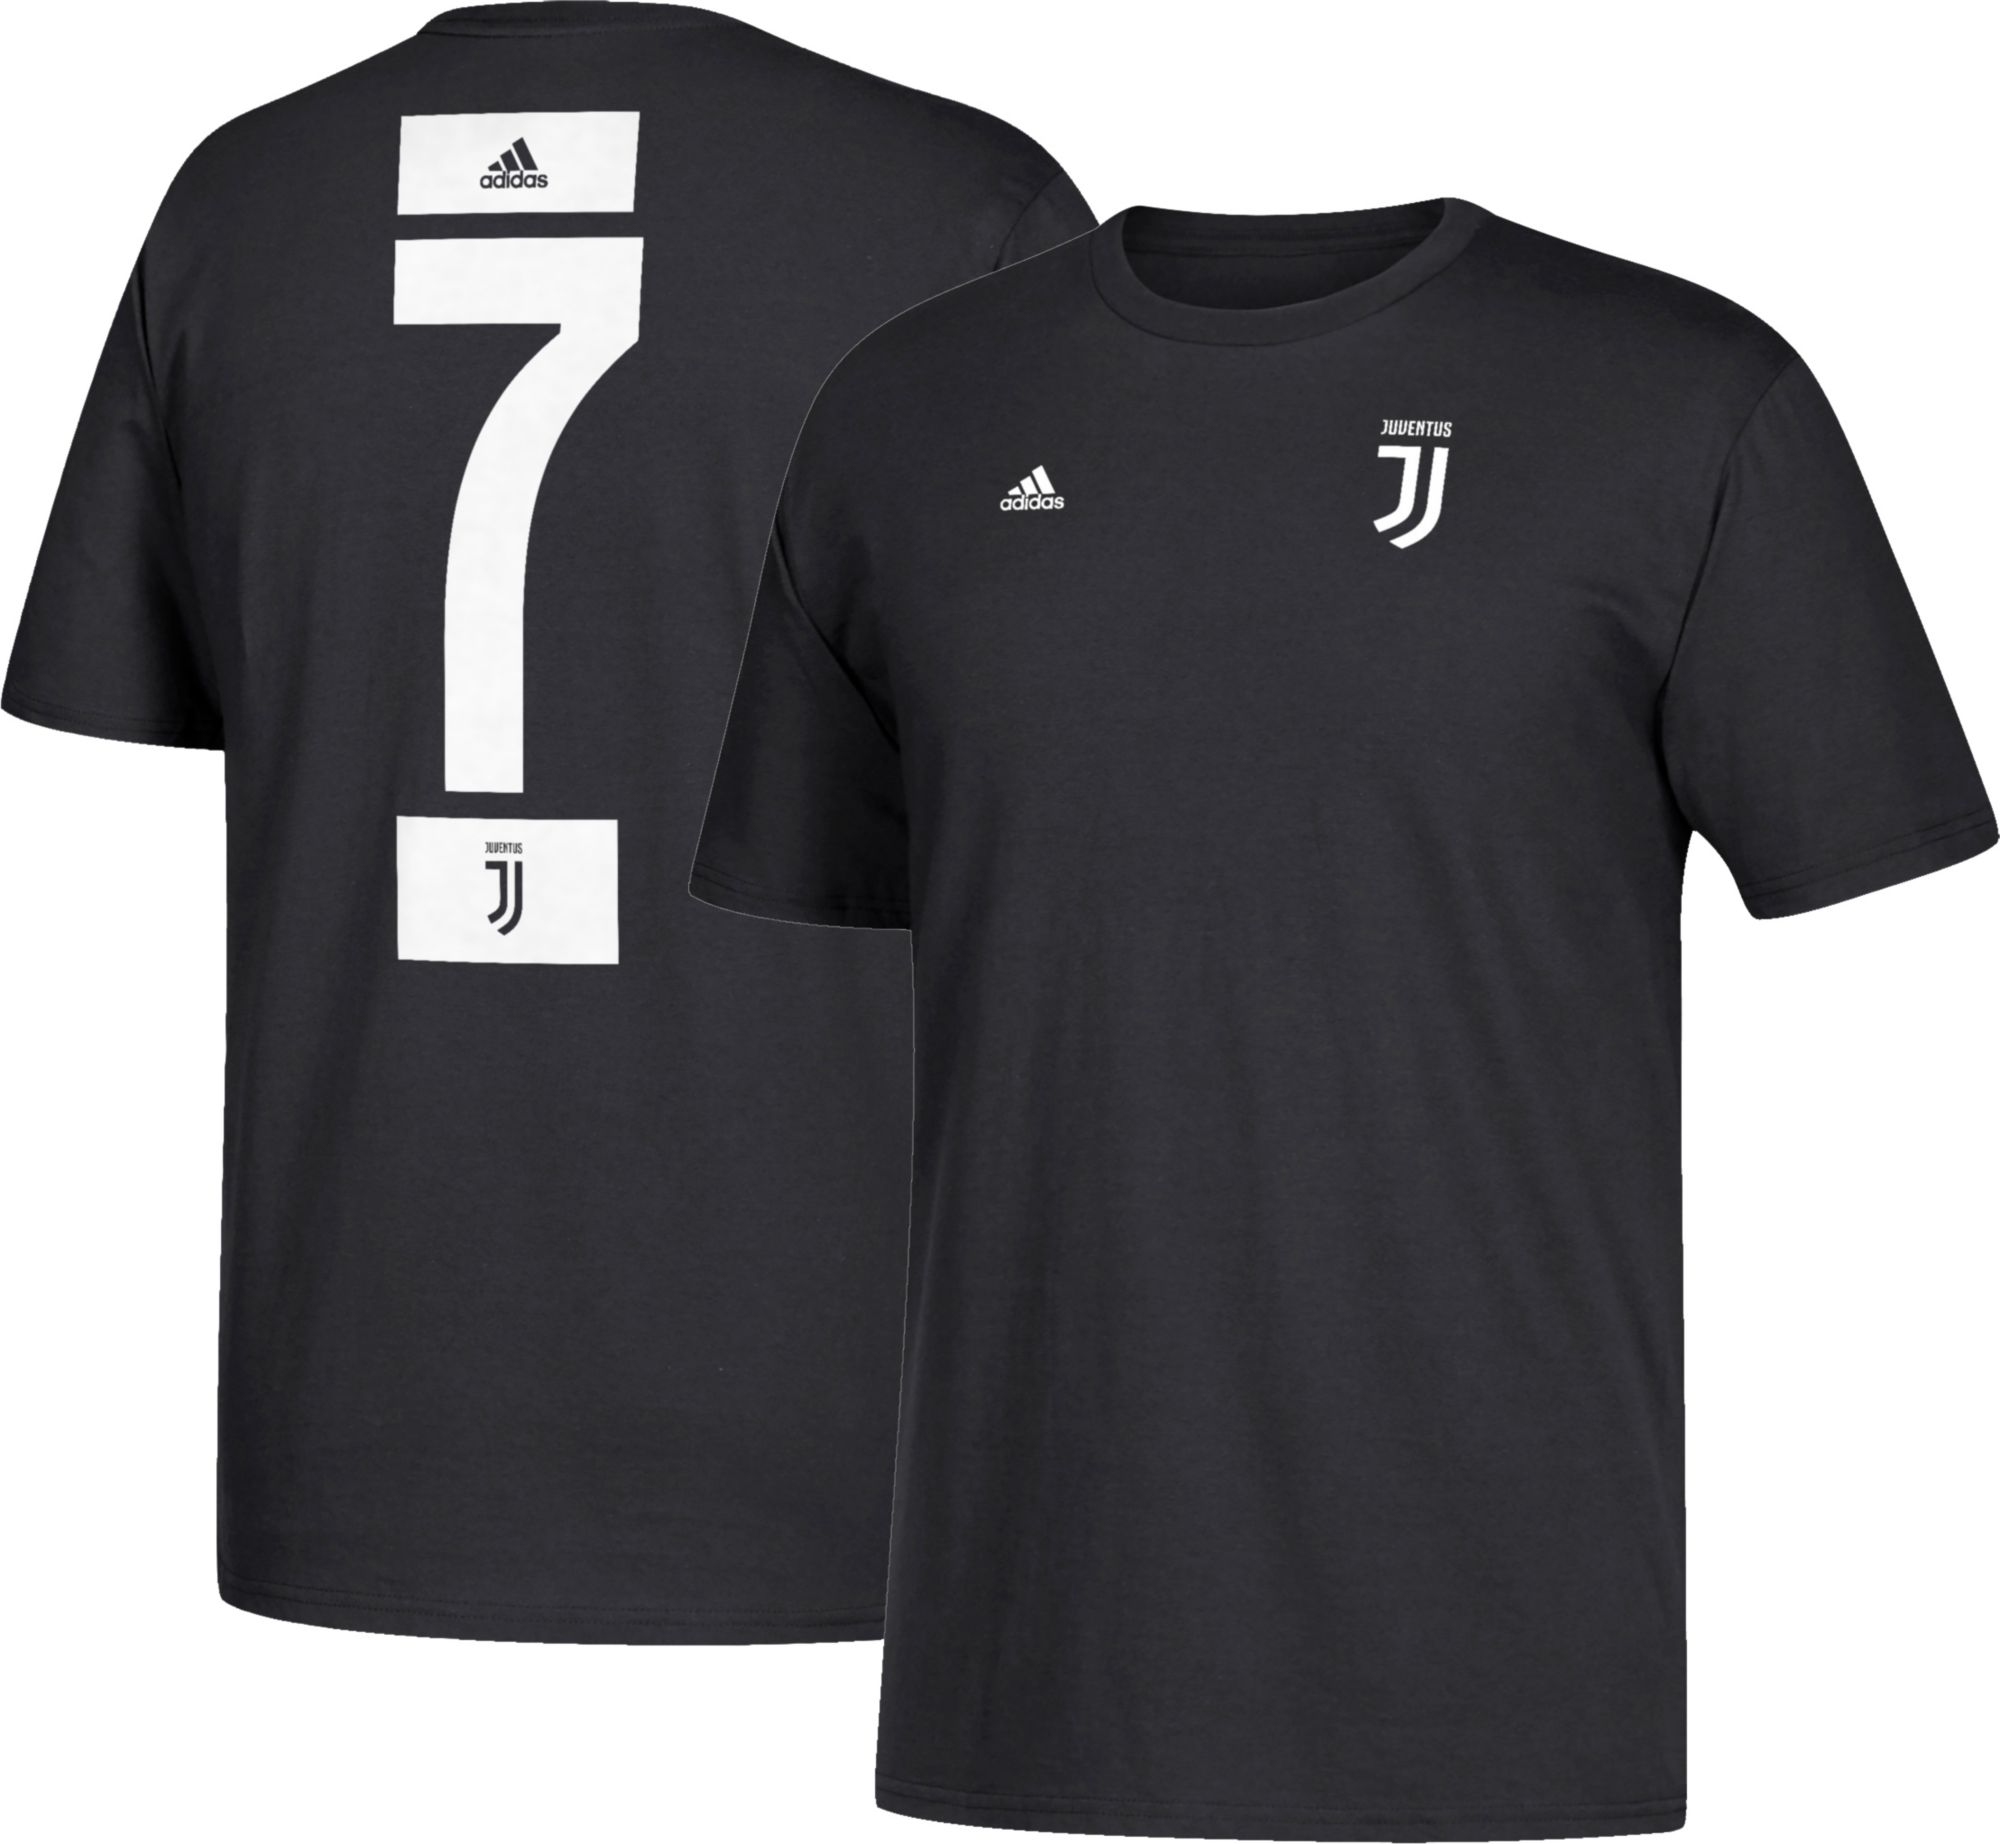 size 40 fef11 240b2 adidas Men's Juventus Cristiano Ronaldo #7 Black Player T-Shirt